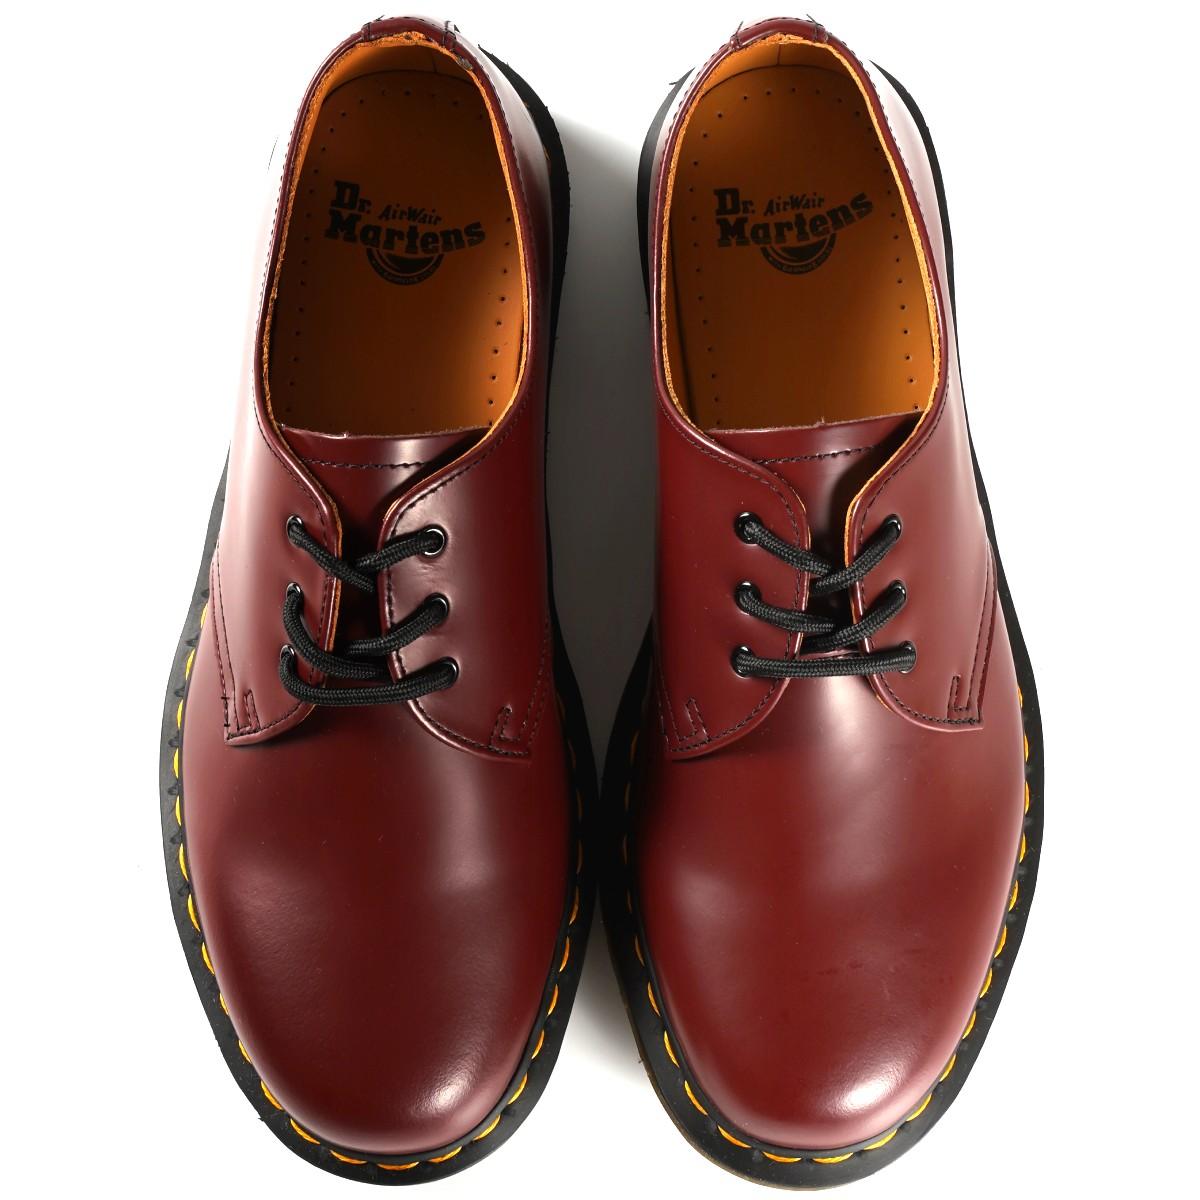 Shoes Shop Martin Small martens Dr Big 1461 Lowtex Dr 3eye Gibson q8WUavw